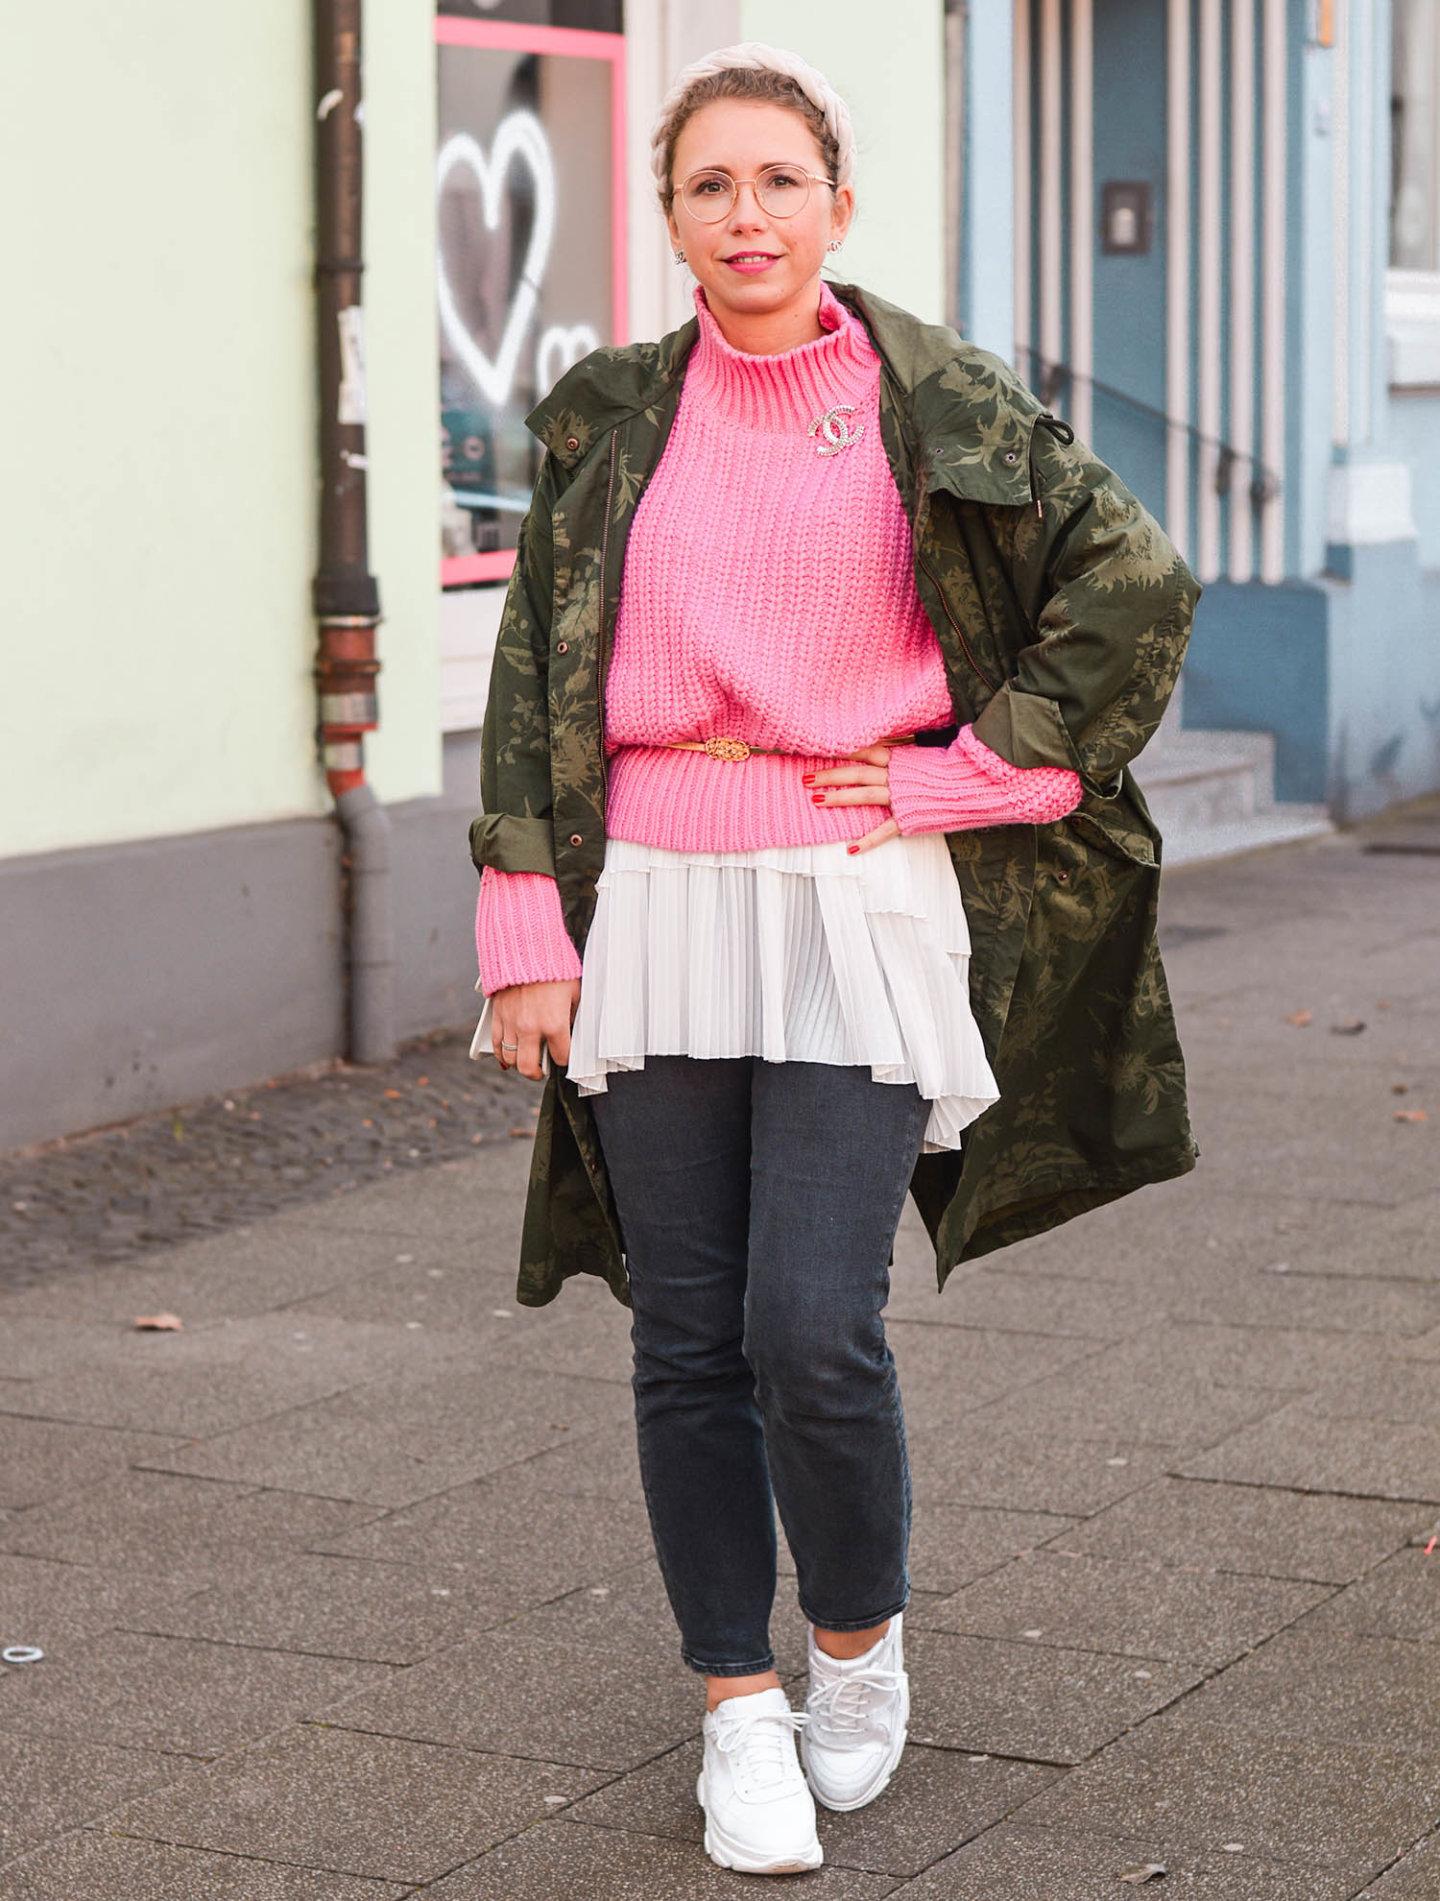 H&M Parka, pinkfarbener Pulli, Zara Bluse und chunky Sneaker